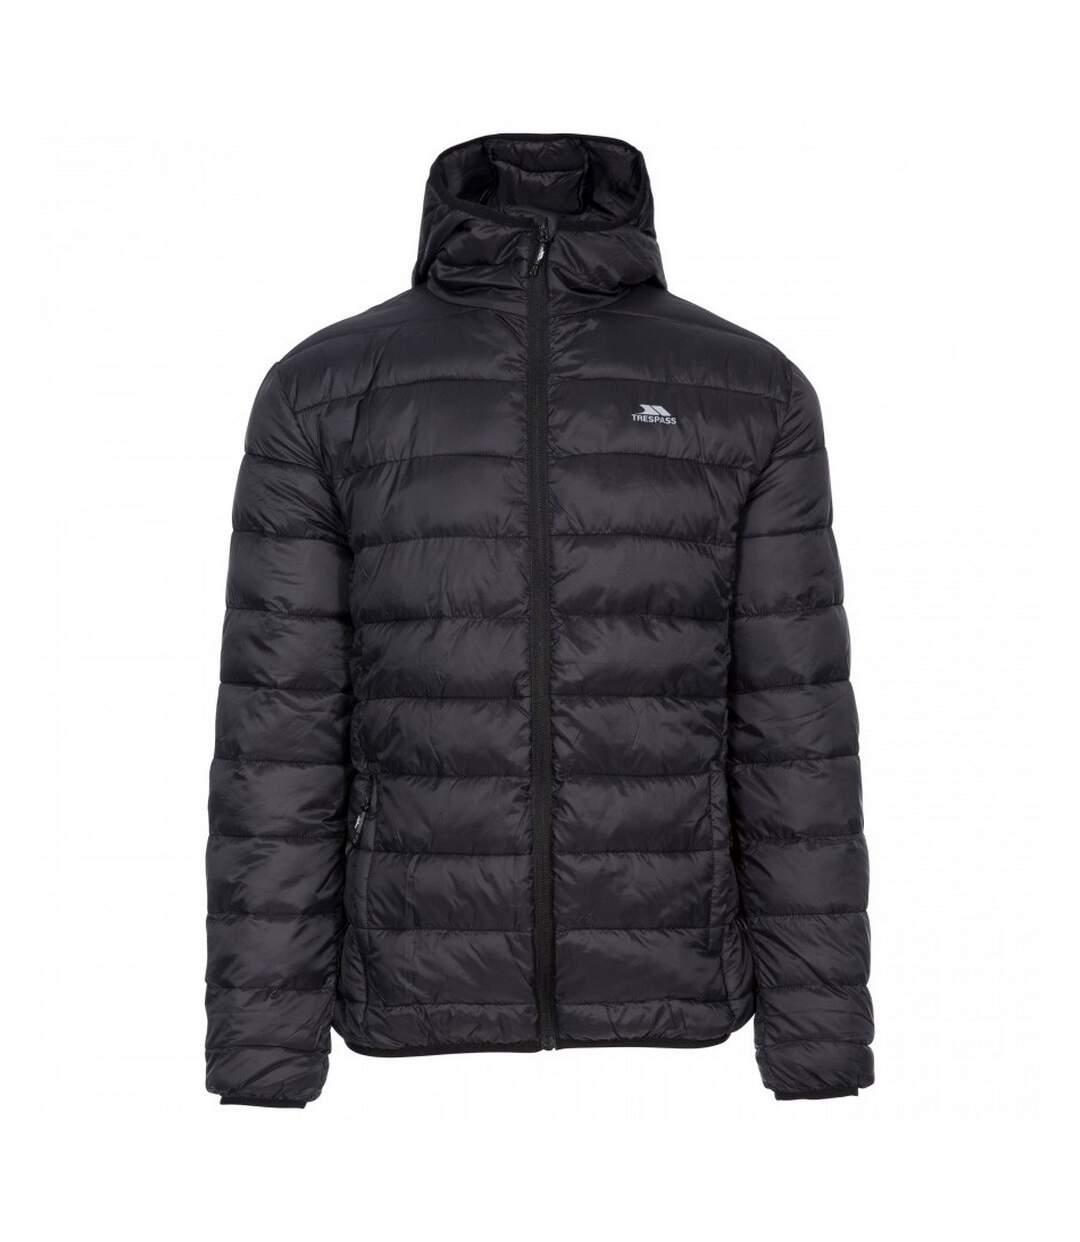 Trespass Mens Carruthers Padded Jacket (Black) - UTTP4898